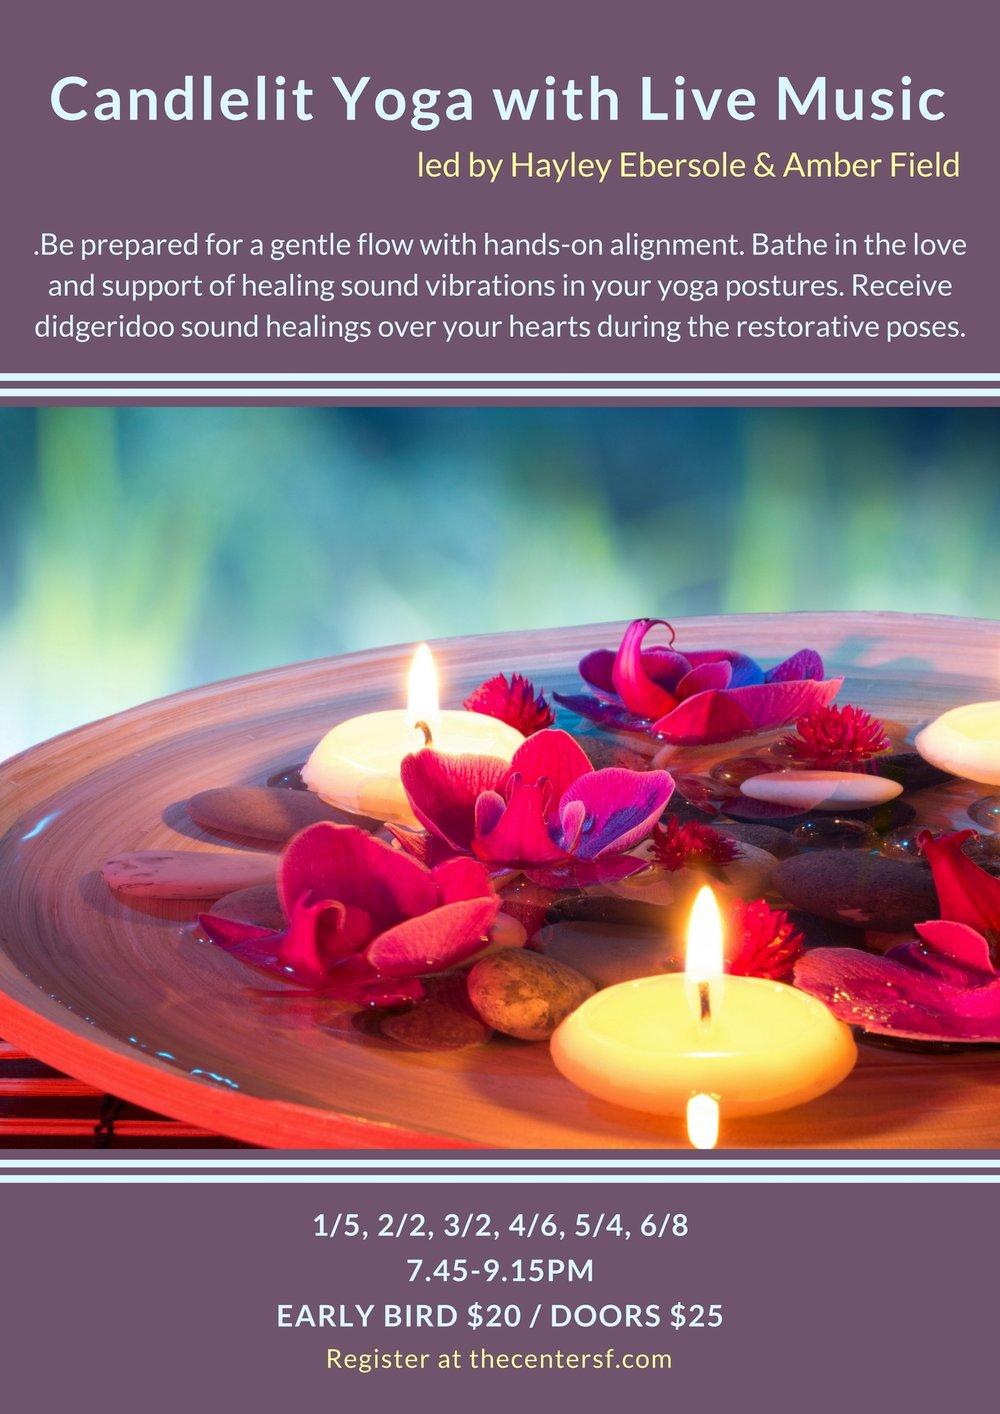 Candlelit flyer.jpg